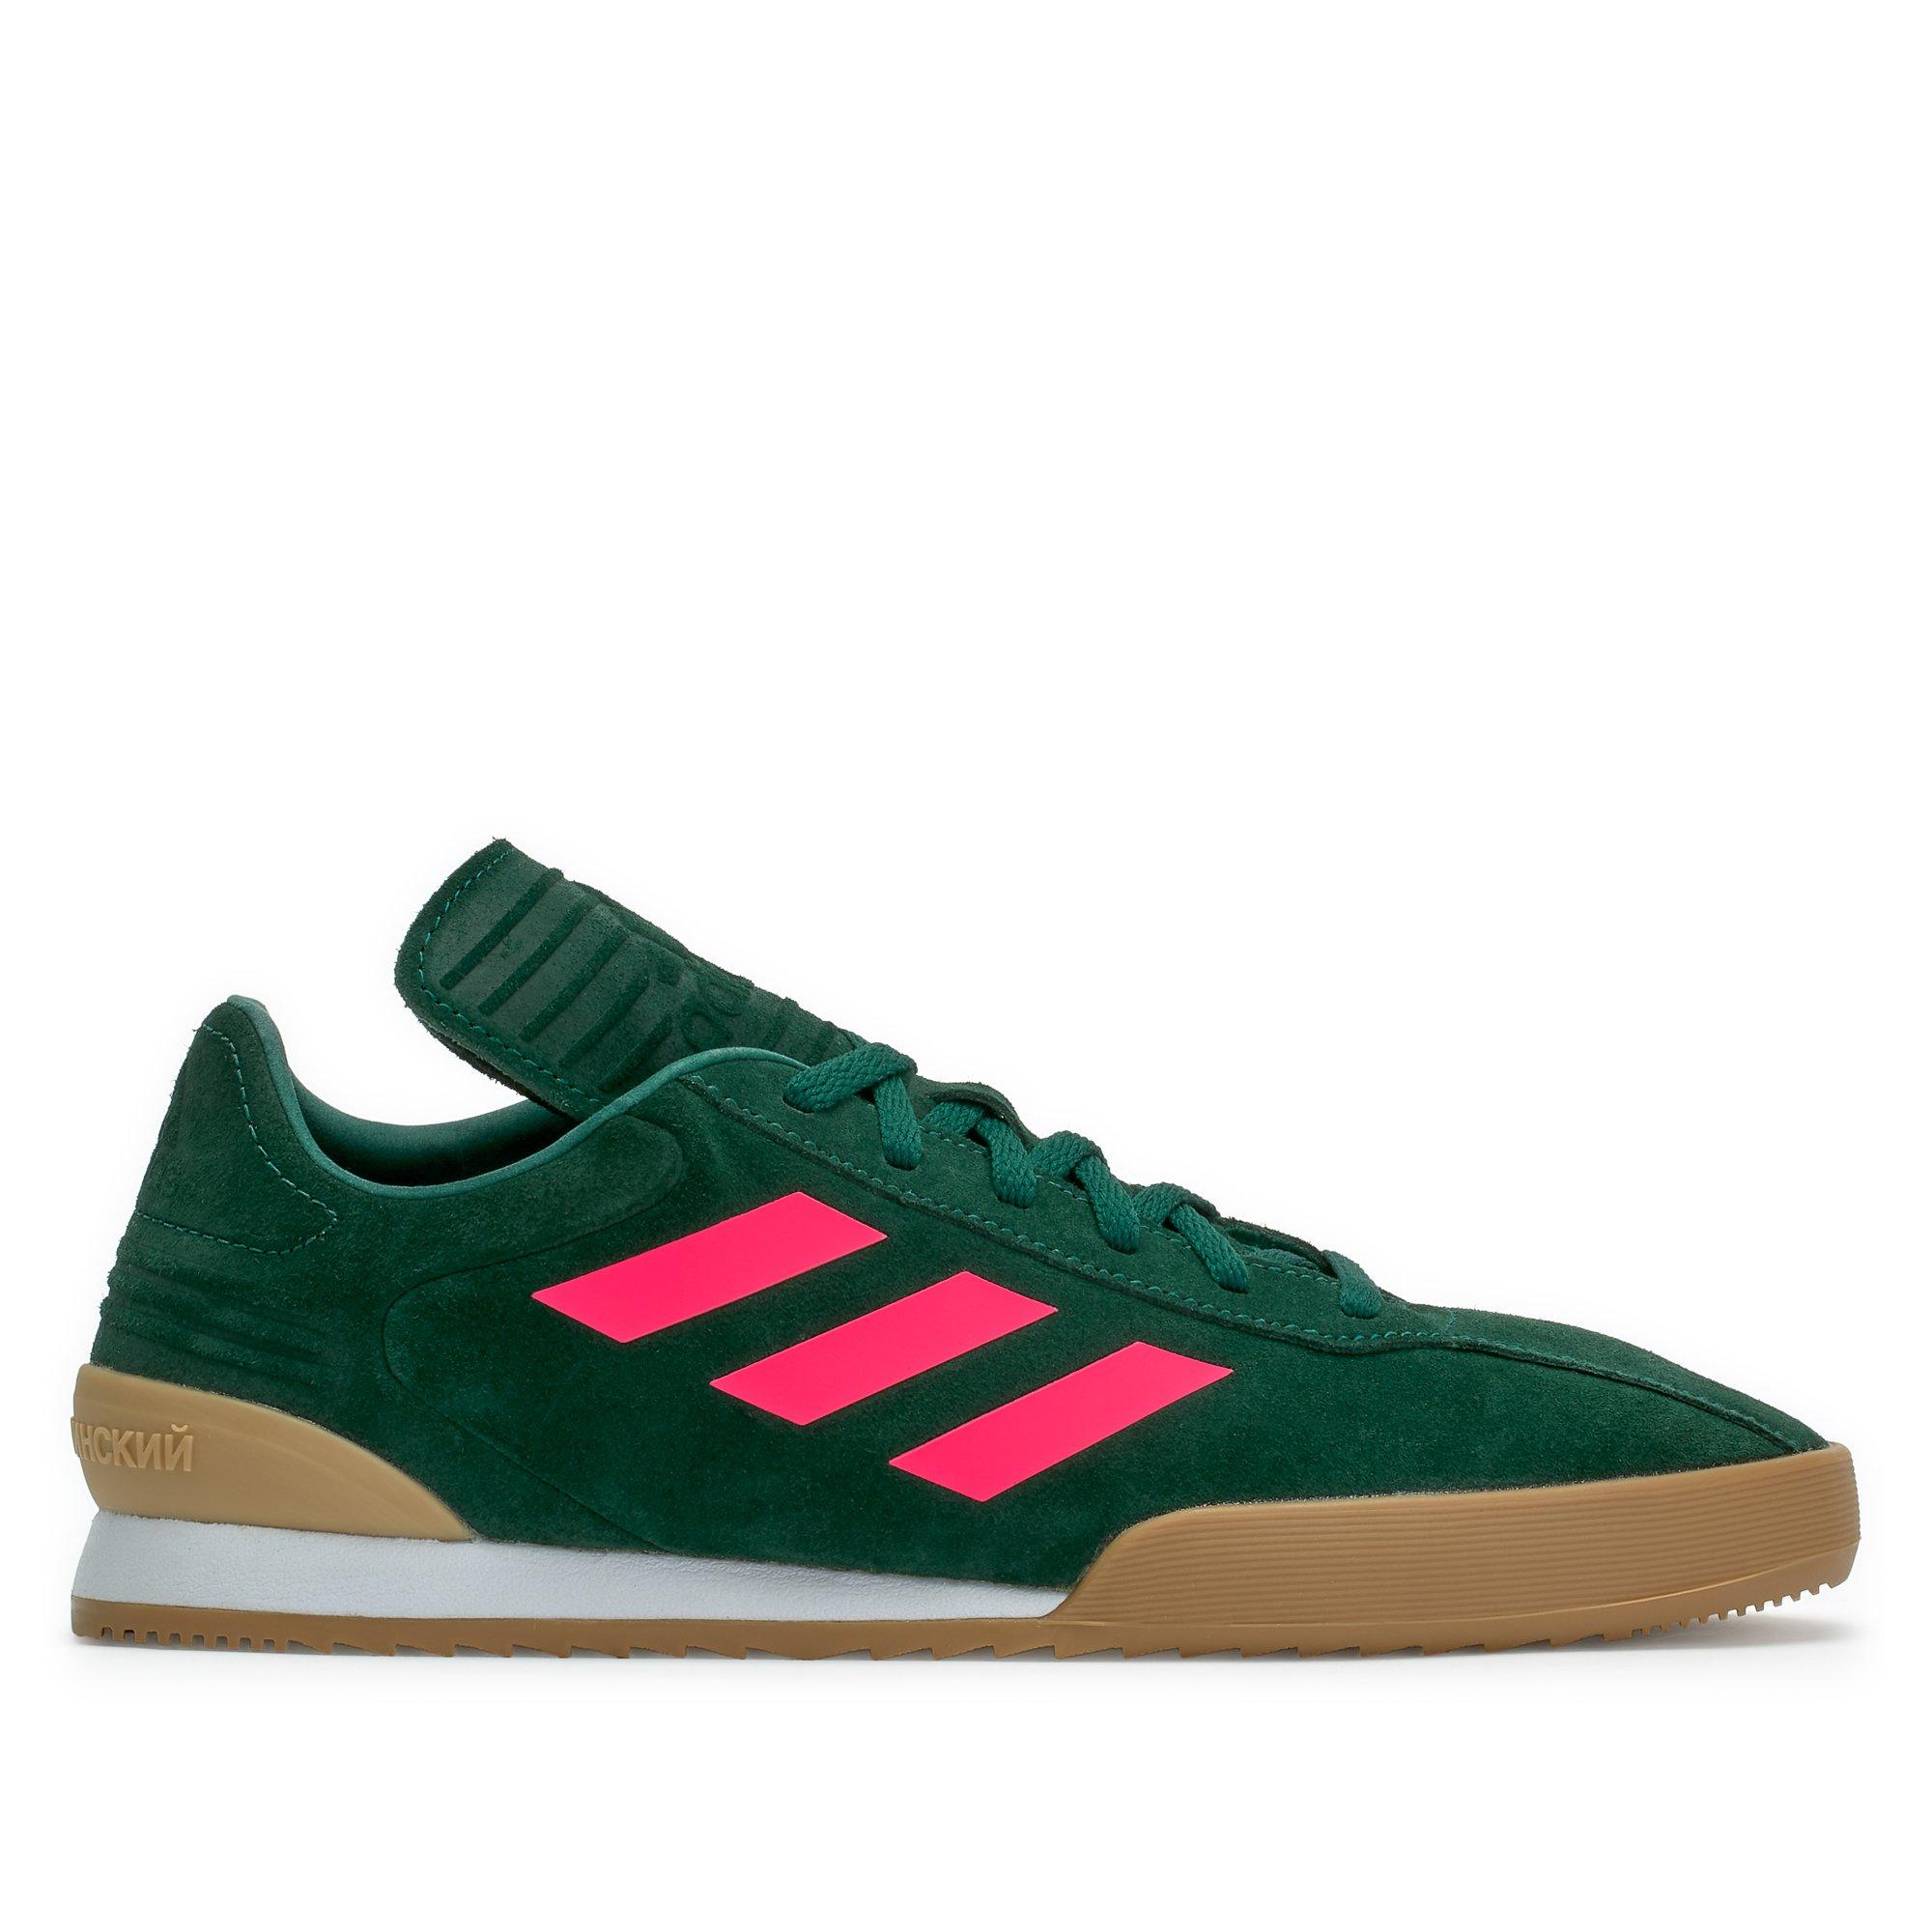 info for 3d1eb 7836d Very Goods  Gosha Rubchinskiy SS18 x adidas Copa Sneakers (Green) – Dover  Street Market NY